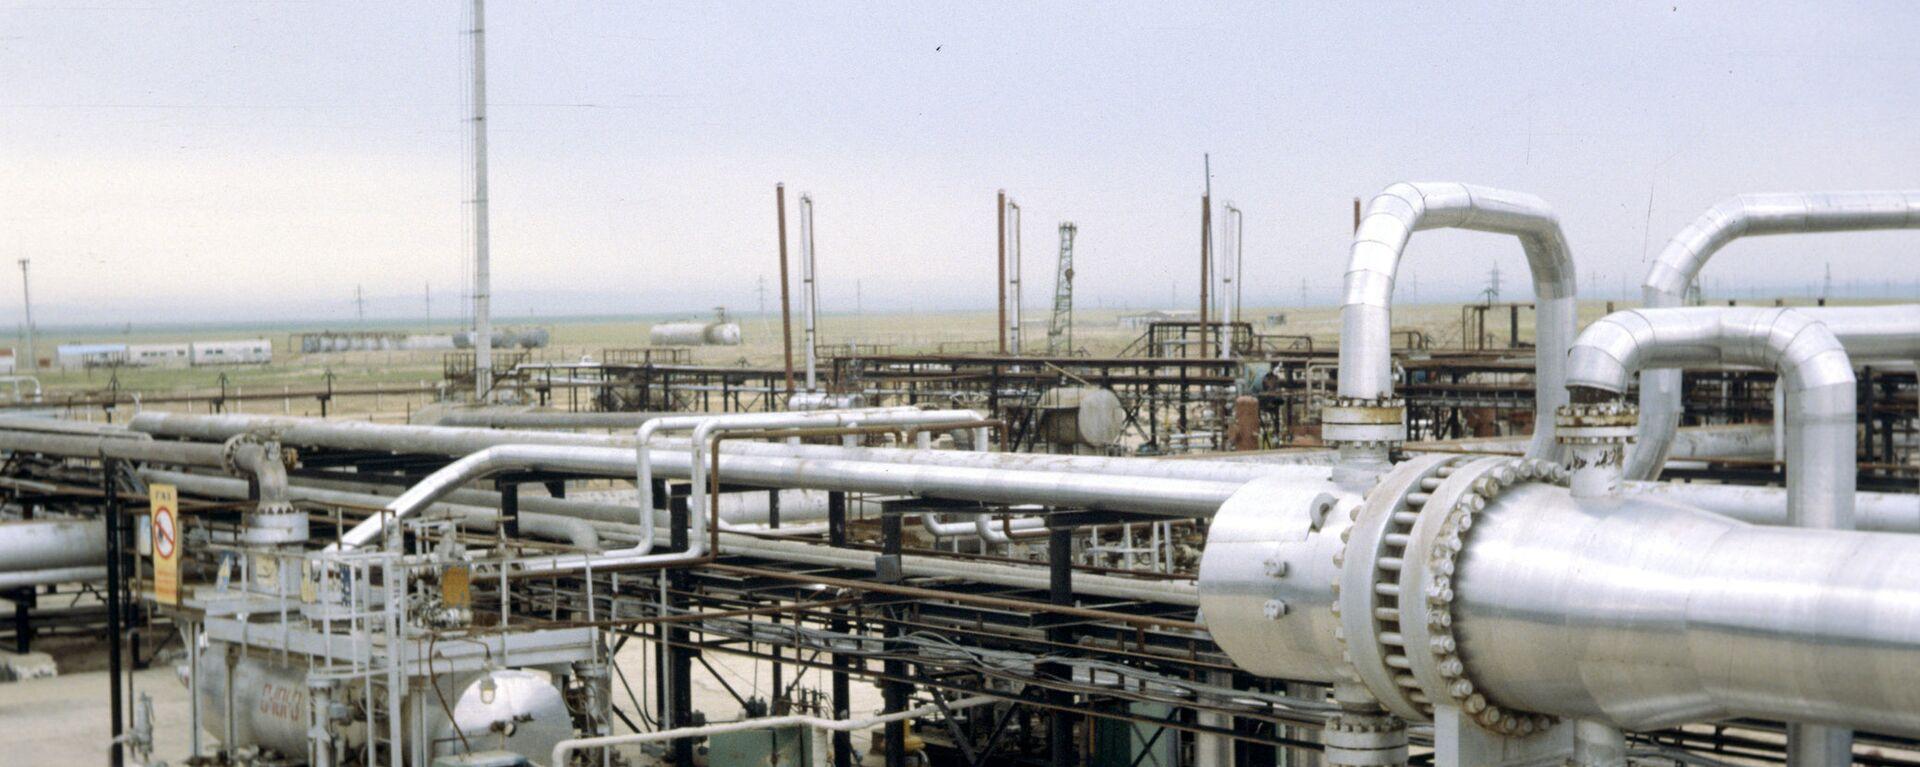 УДП «Шуртанский газо-химический комплекс»  - Sputnik Узбекистан, 1920, 30.09.2021